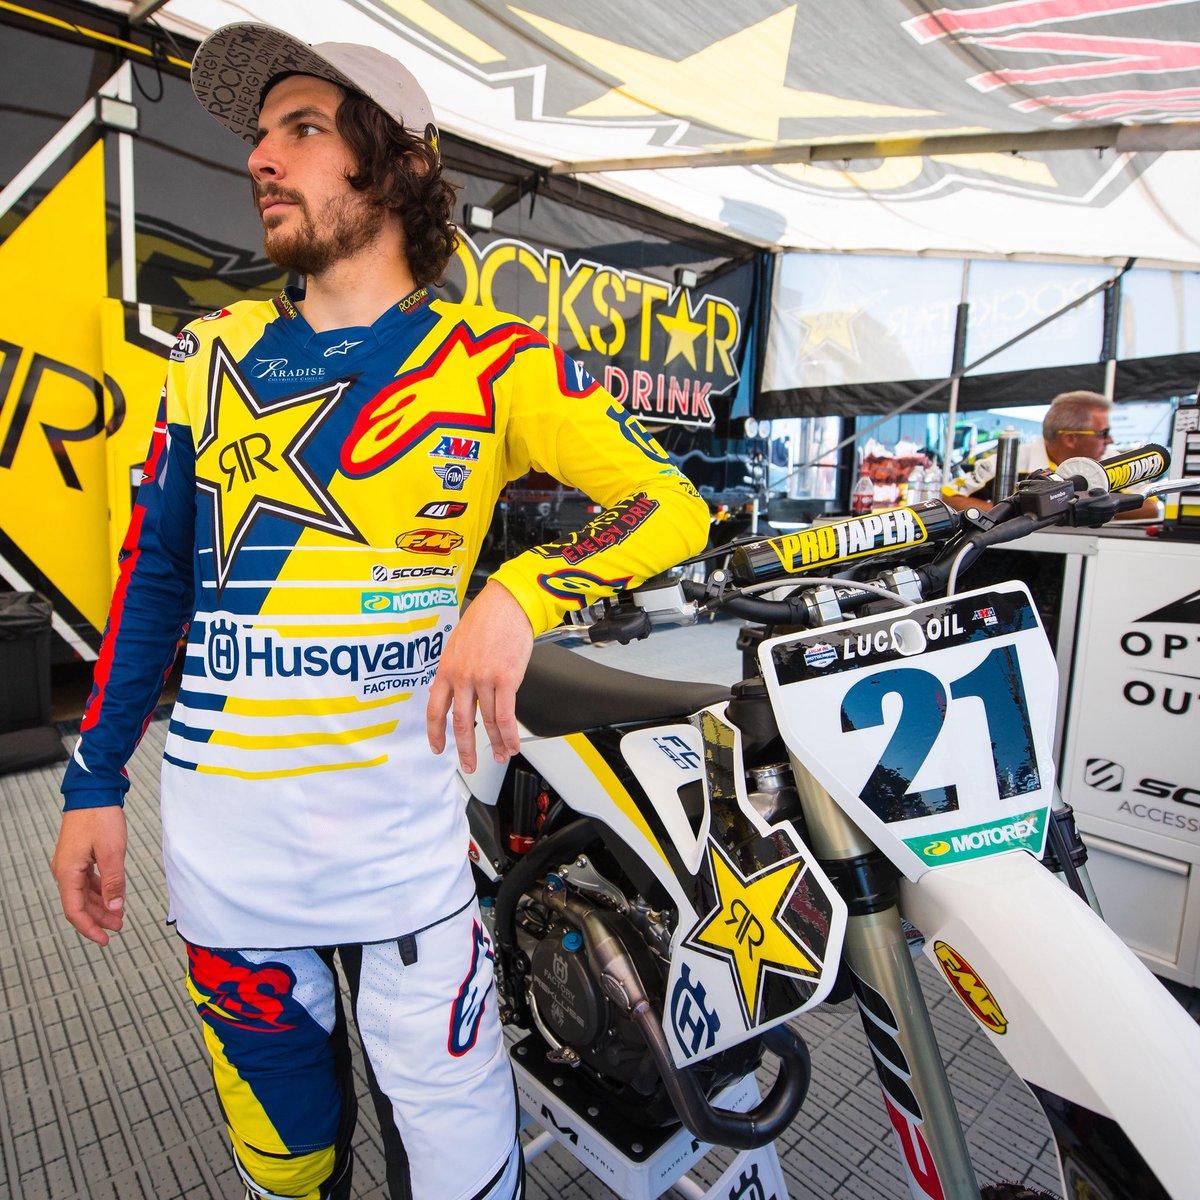 Tucked 🙅🏻♂️ PC. @Cudby @rockstarenergy @Rockstar_Racing @alpinestarsmx https://t.co/jdZtqGVTW6